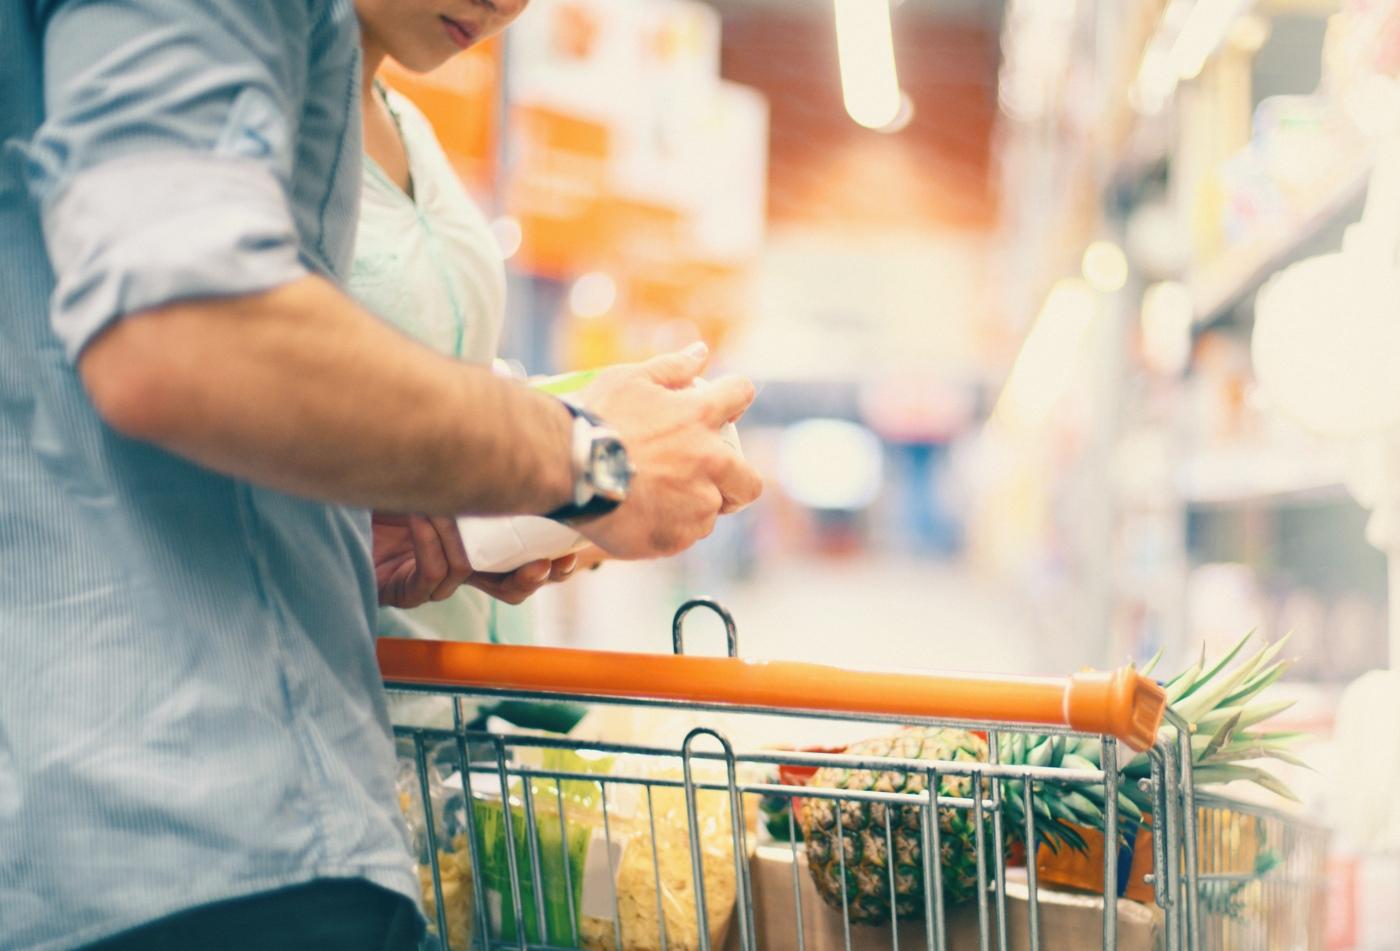 Casal a ler rótulos de alimentos par verificar diferentes formas de açucar nos alimentos